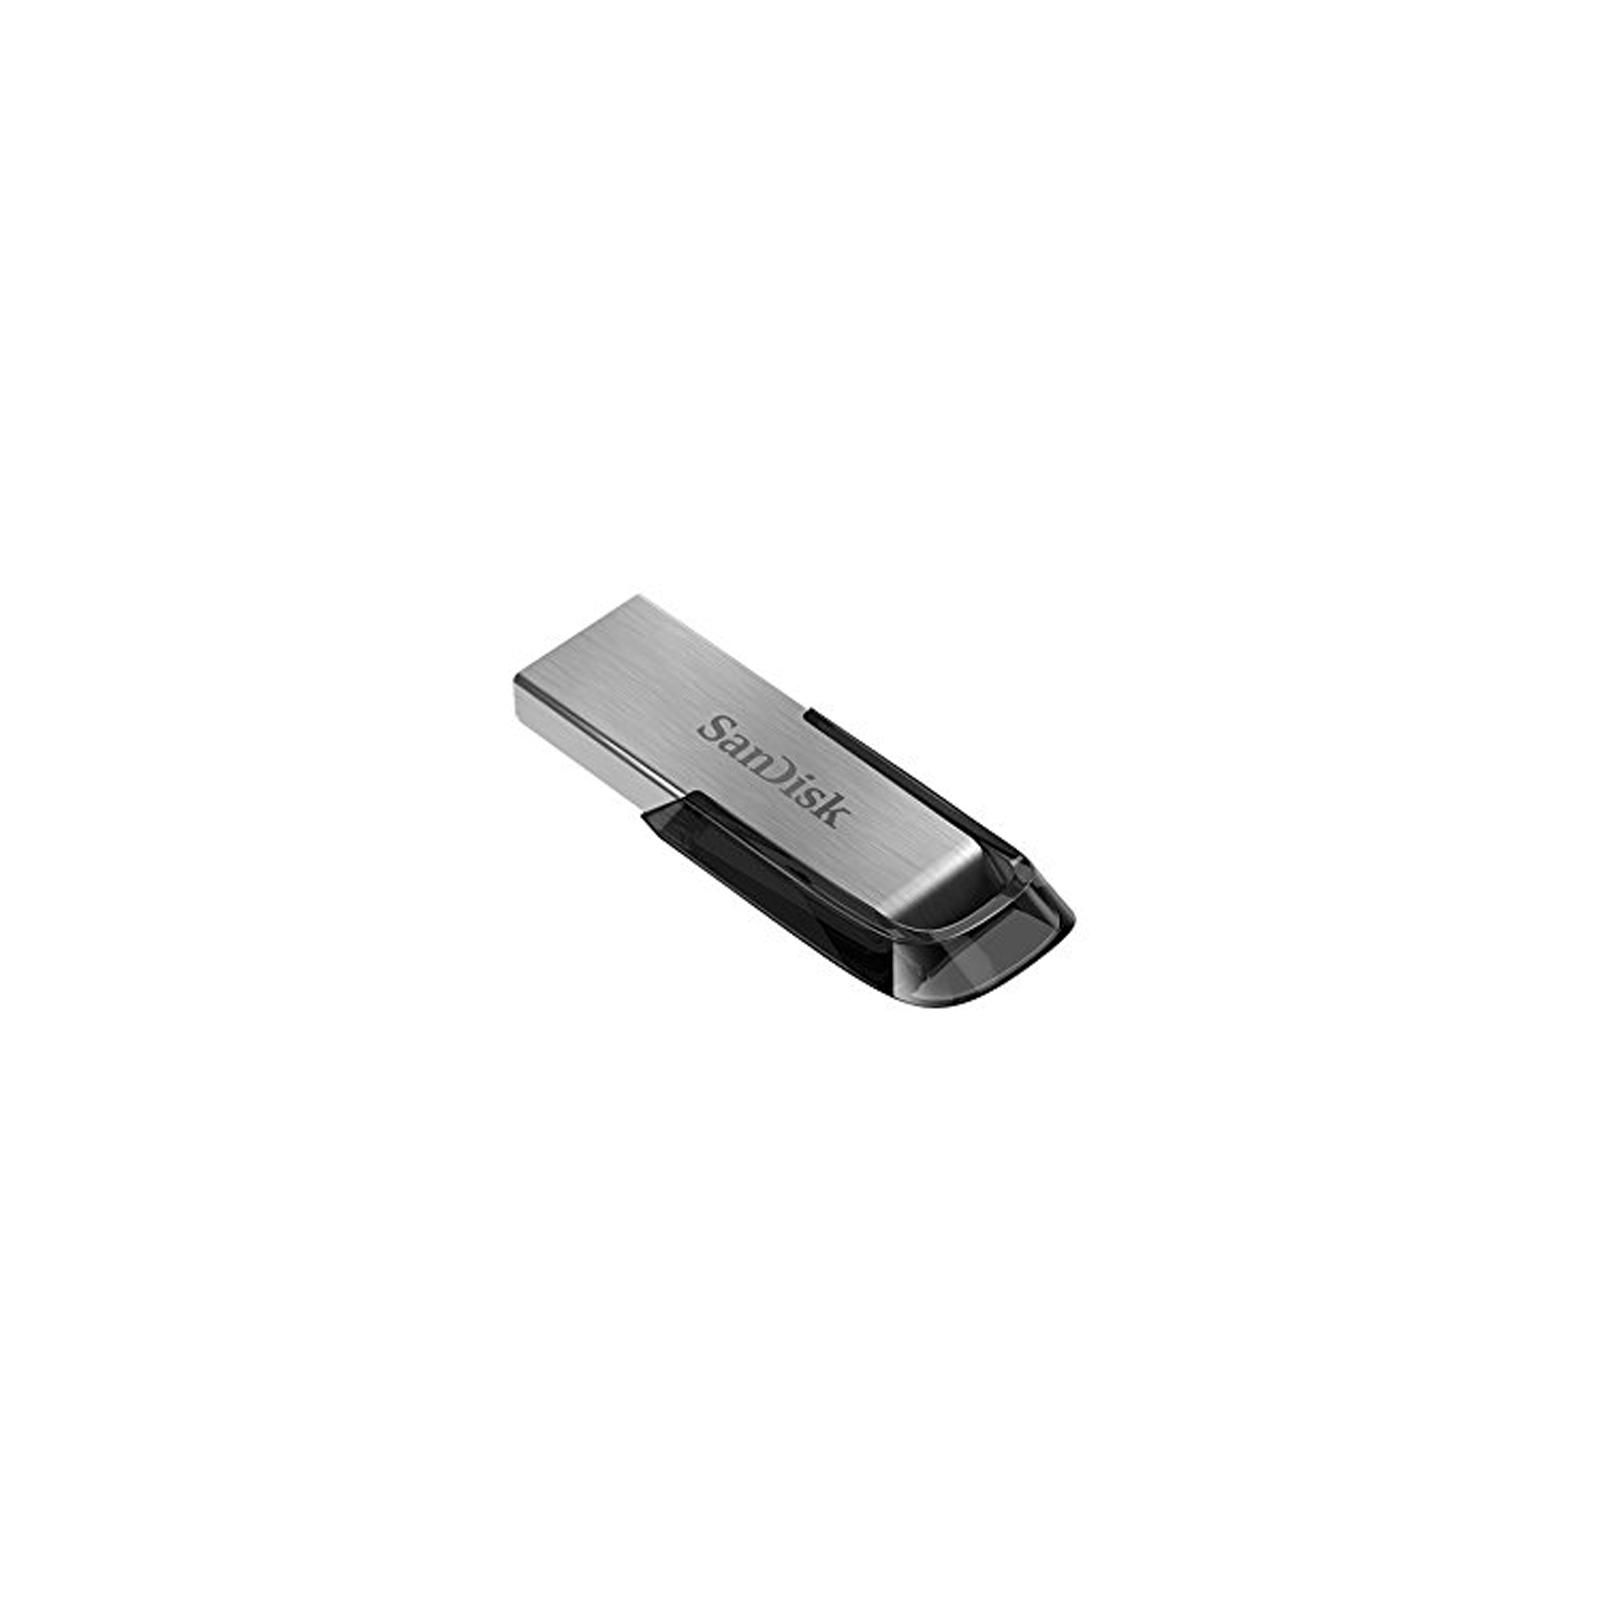 USB флеш накопитель SANDISK 64GB Flair USB 3.0 (SDCZ73-064G-G46) изображение 2